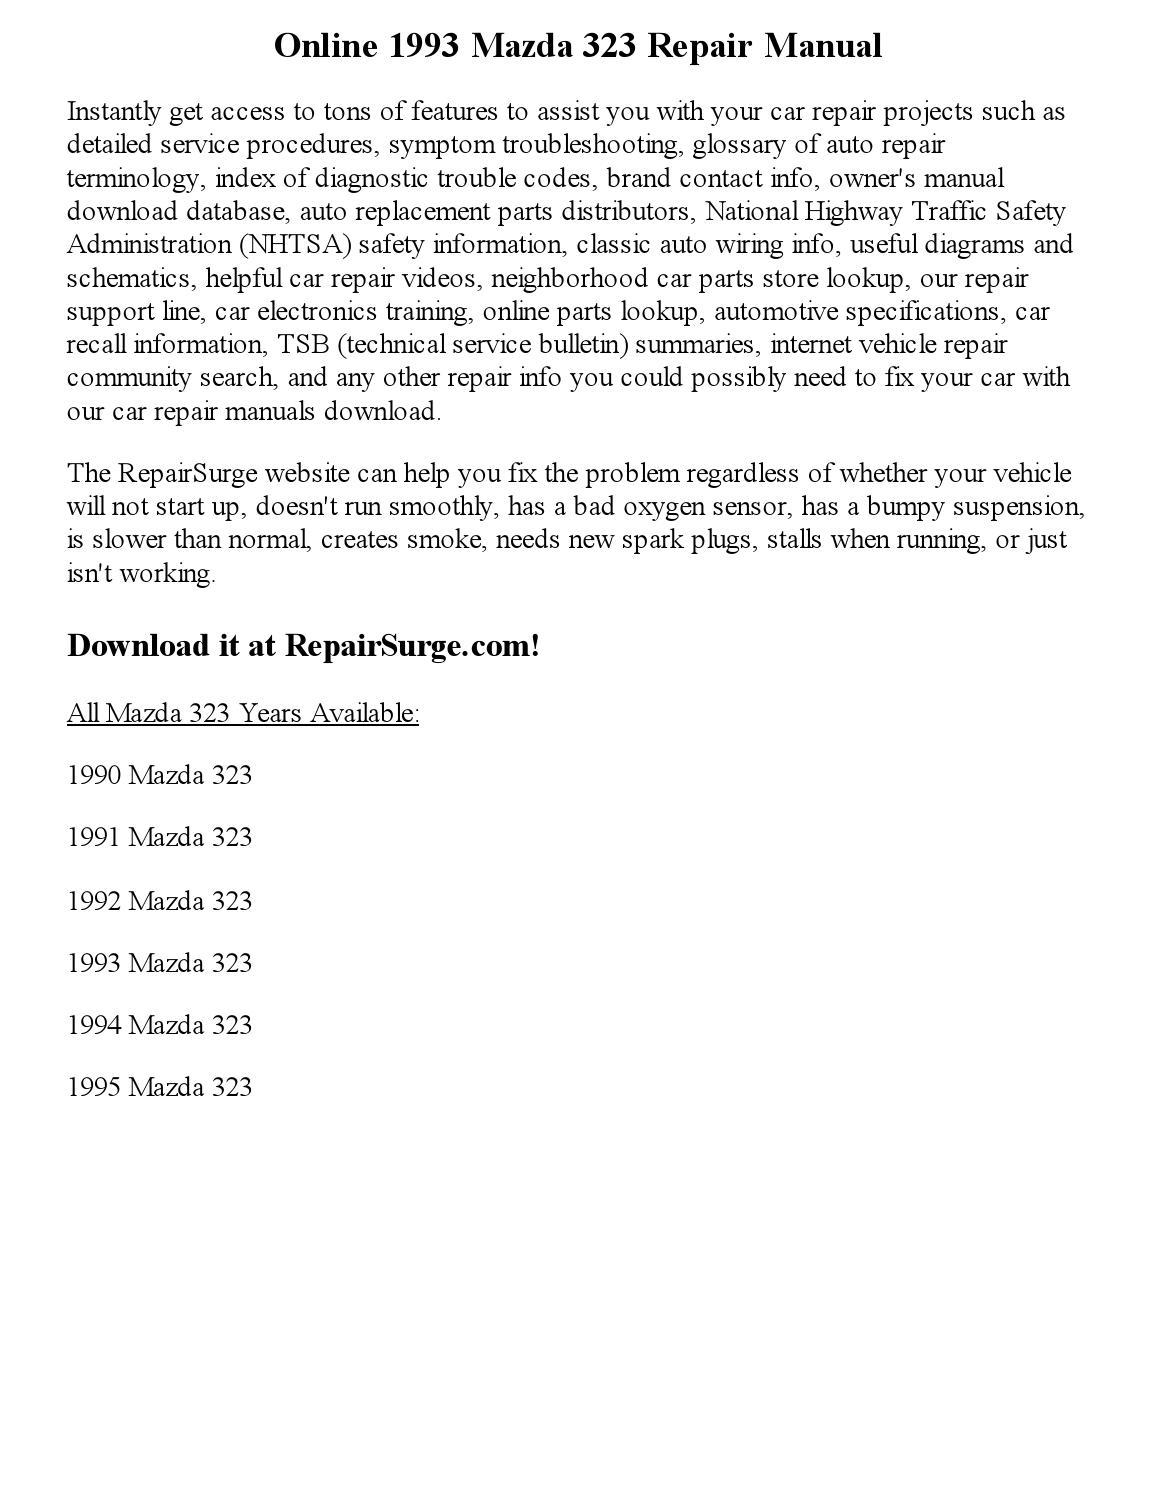 Mazda Miata Parts Diagram Car Repair Manuals And Wiring On A 1993 Fuse Box Service Manual 323 1988